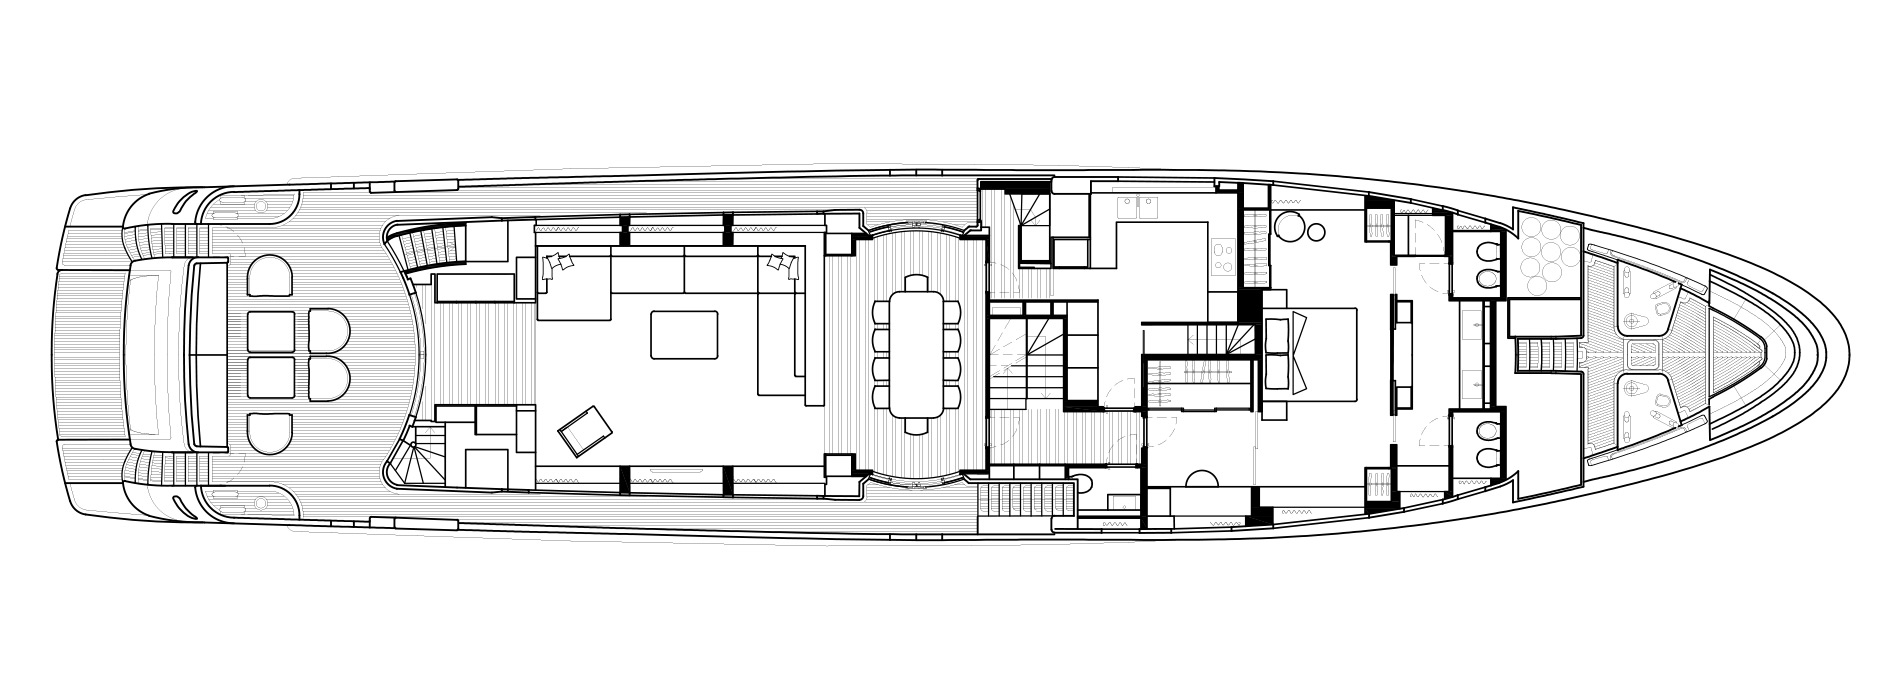 Sanlorenzo Yachts SD126 Cubierta principal Versione A